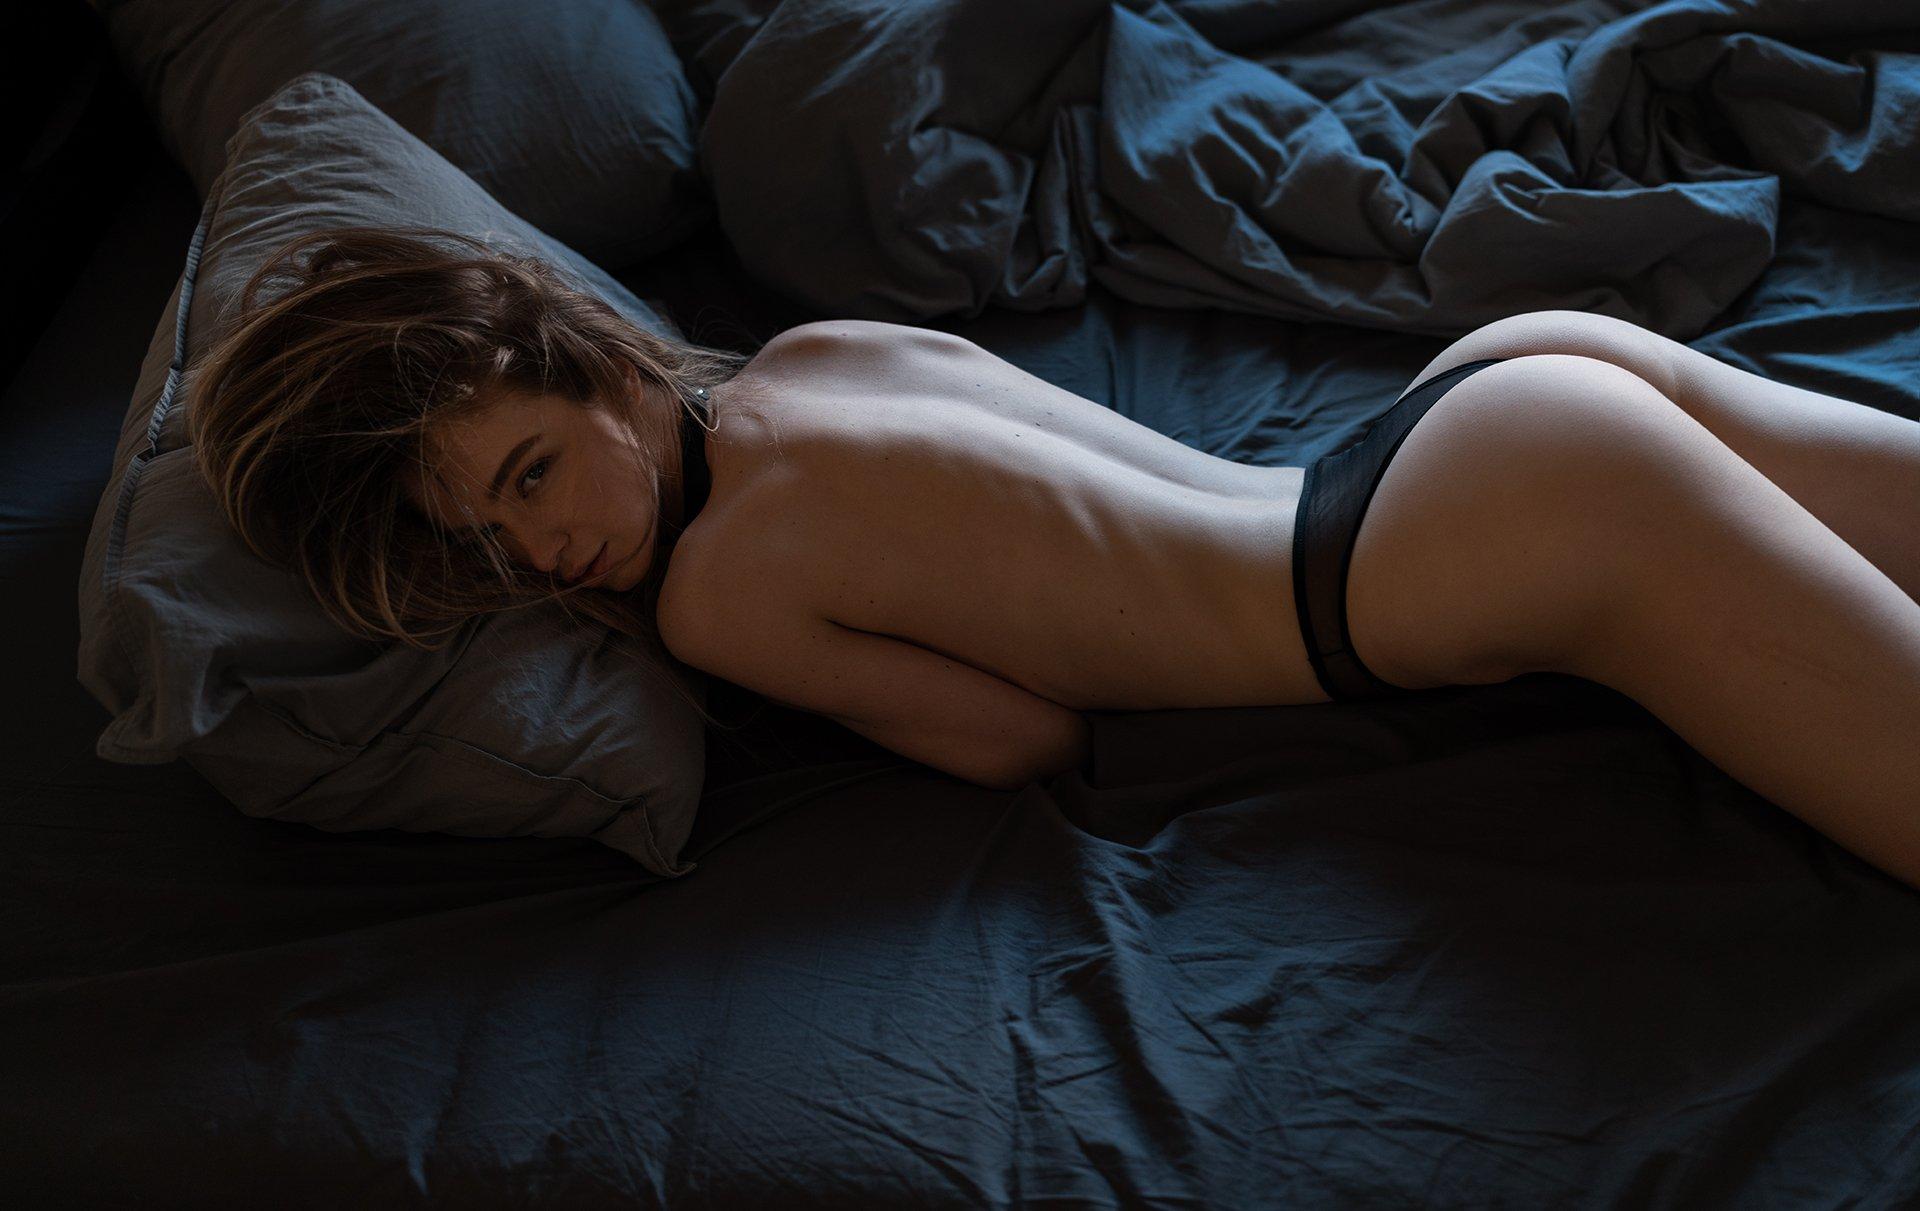 girl, nude, bed, at home, natural light, коверильича, Роман Филиппов